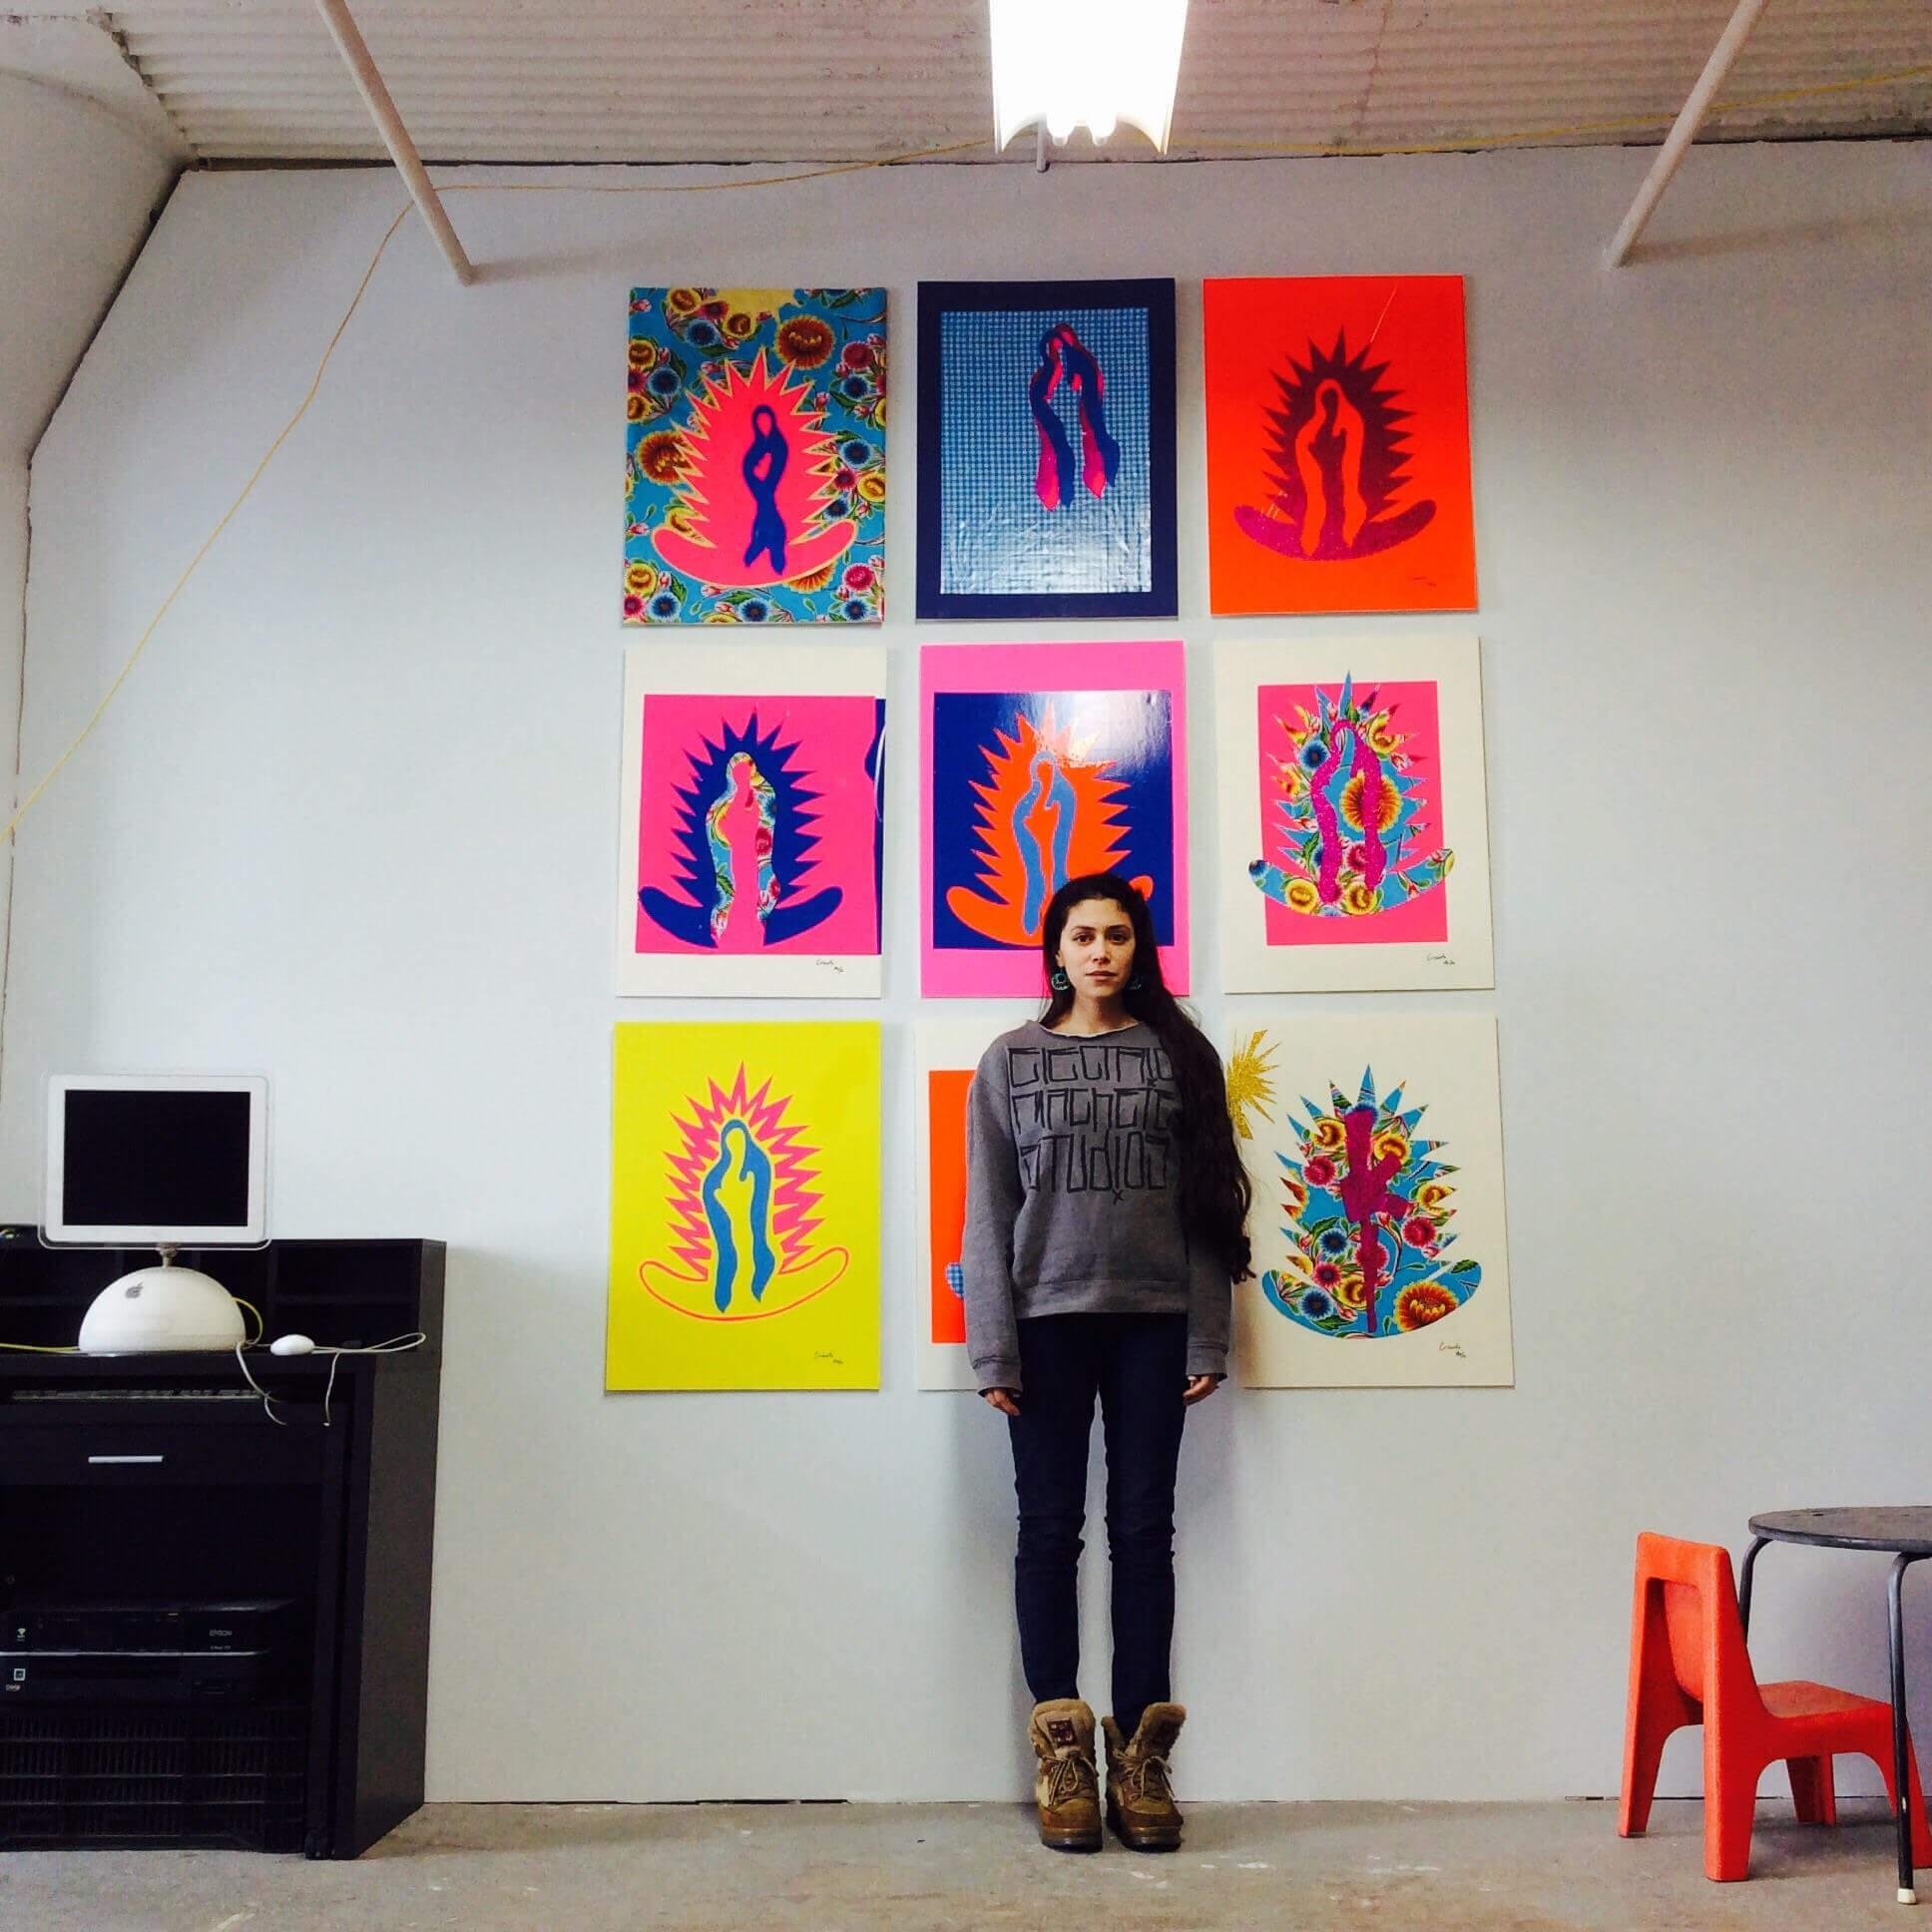 Artist-Run in the Twin Cities by Sheila Regan > The Rib